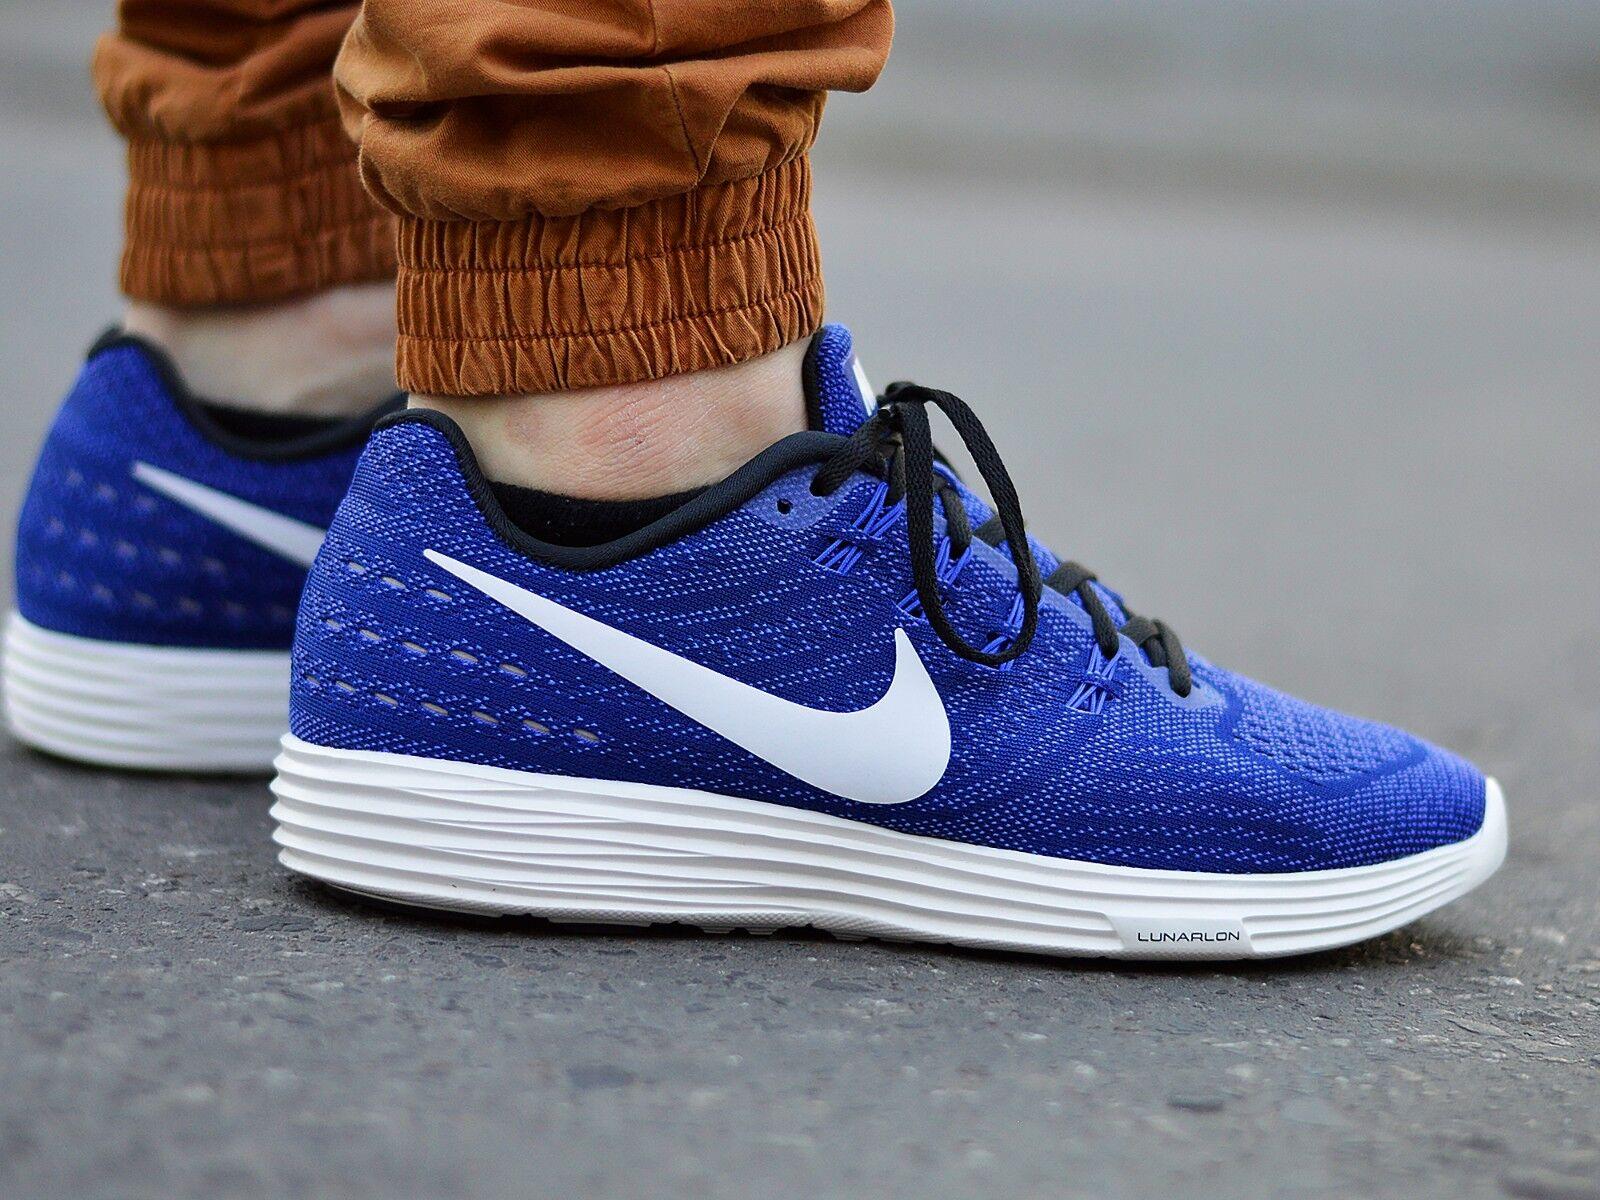 Nike Lunartempo 2 818097-410 Men's Sneakers